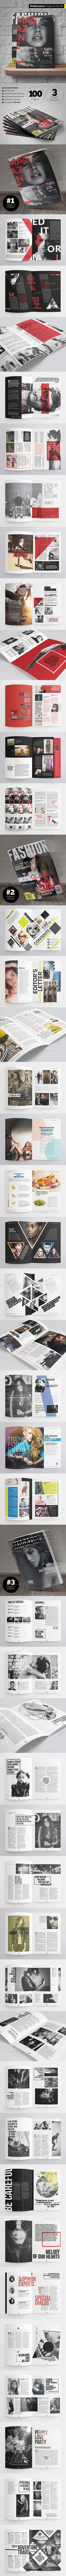 Cultura Minimal Magazine Template | Pinterest | Diseño editorial ...